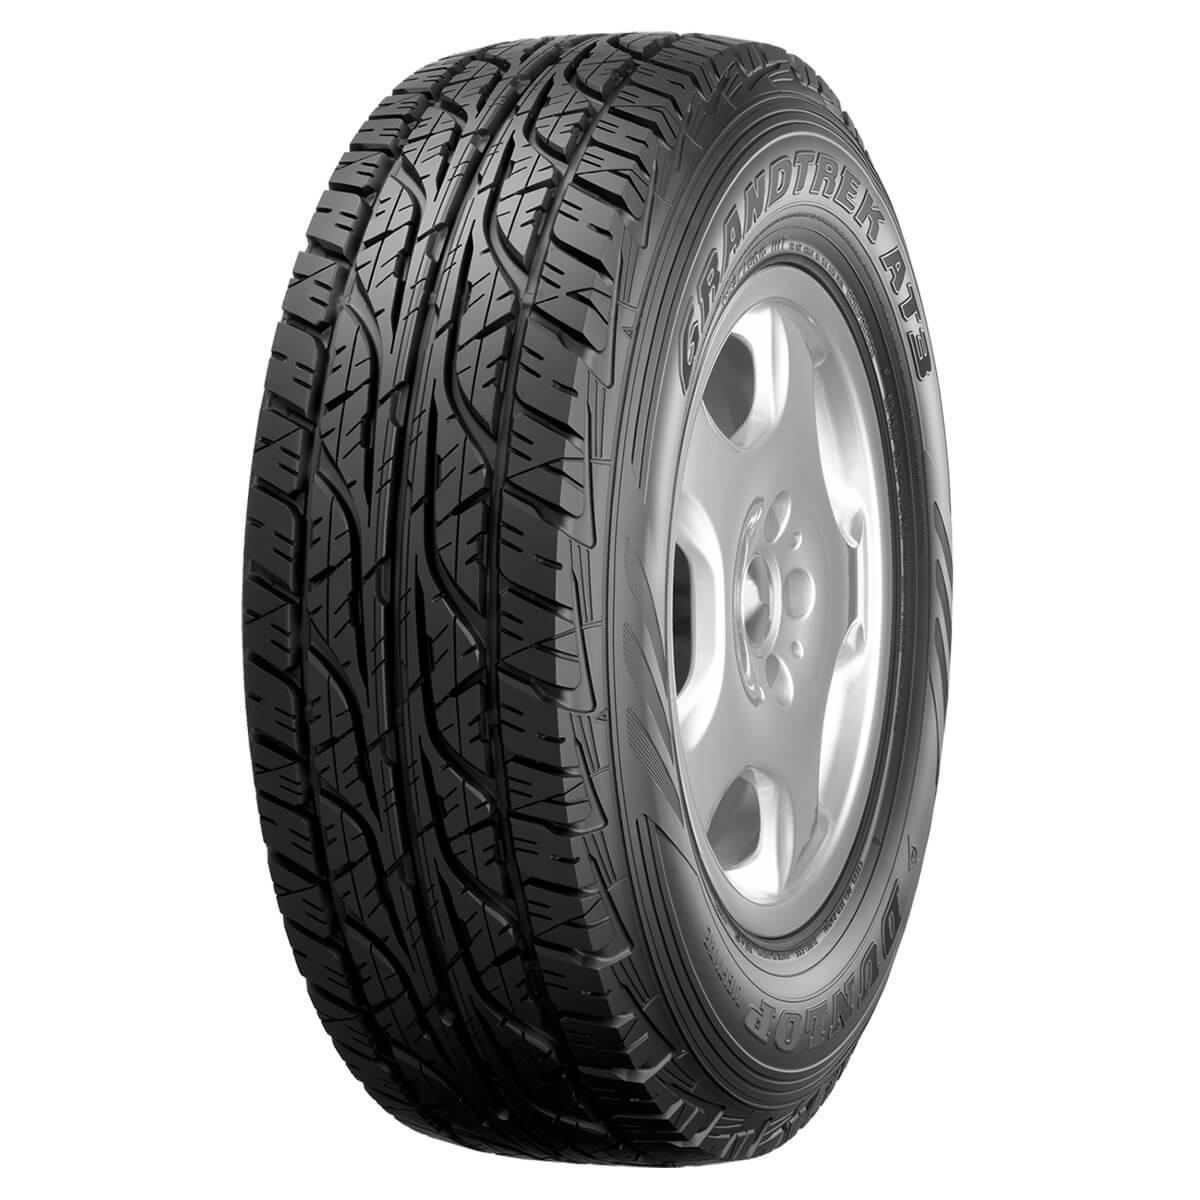 Pneu Dunlop Grandtrek AT3 205/70 R15 96T - Cantele Centro Automotivo